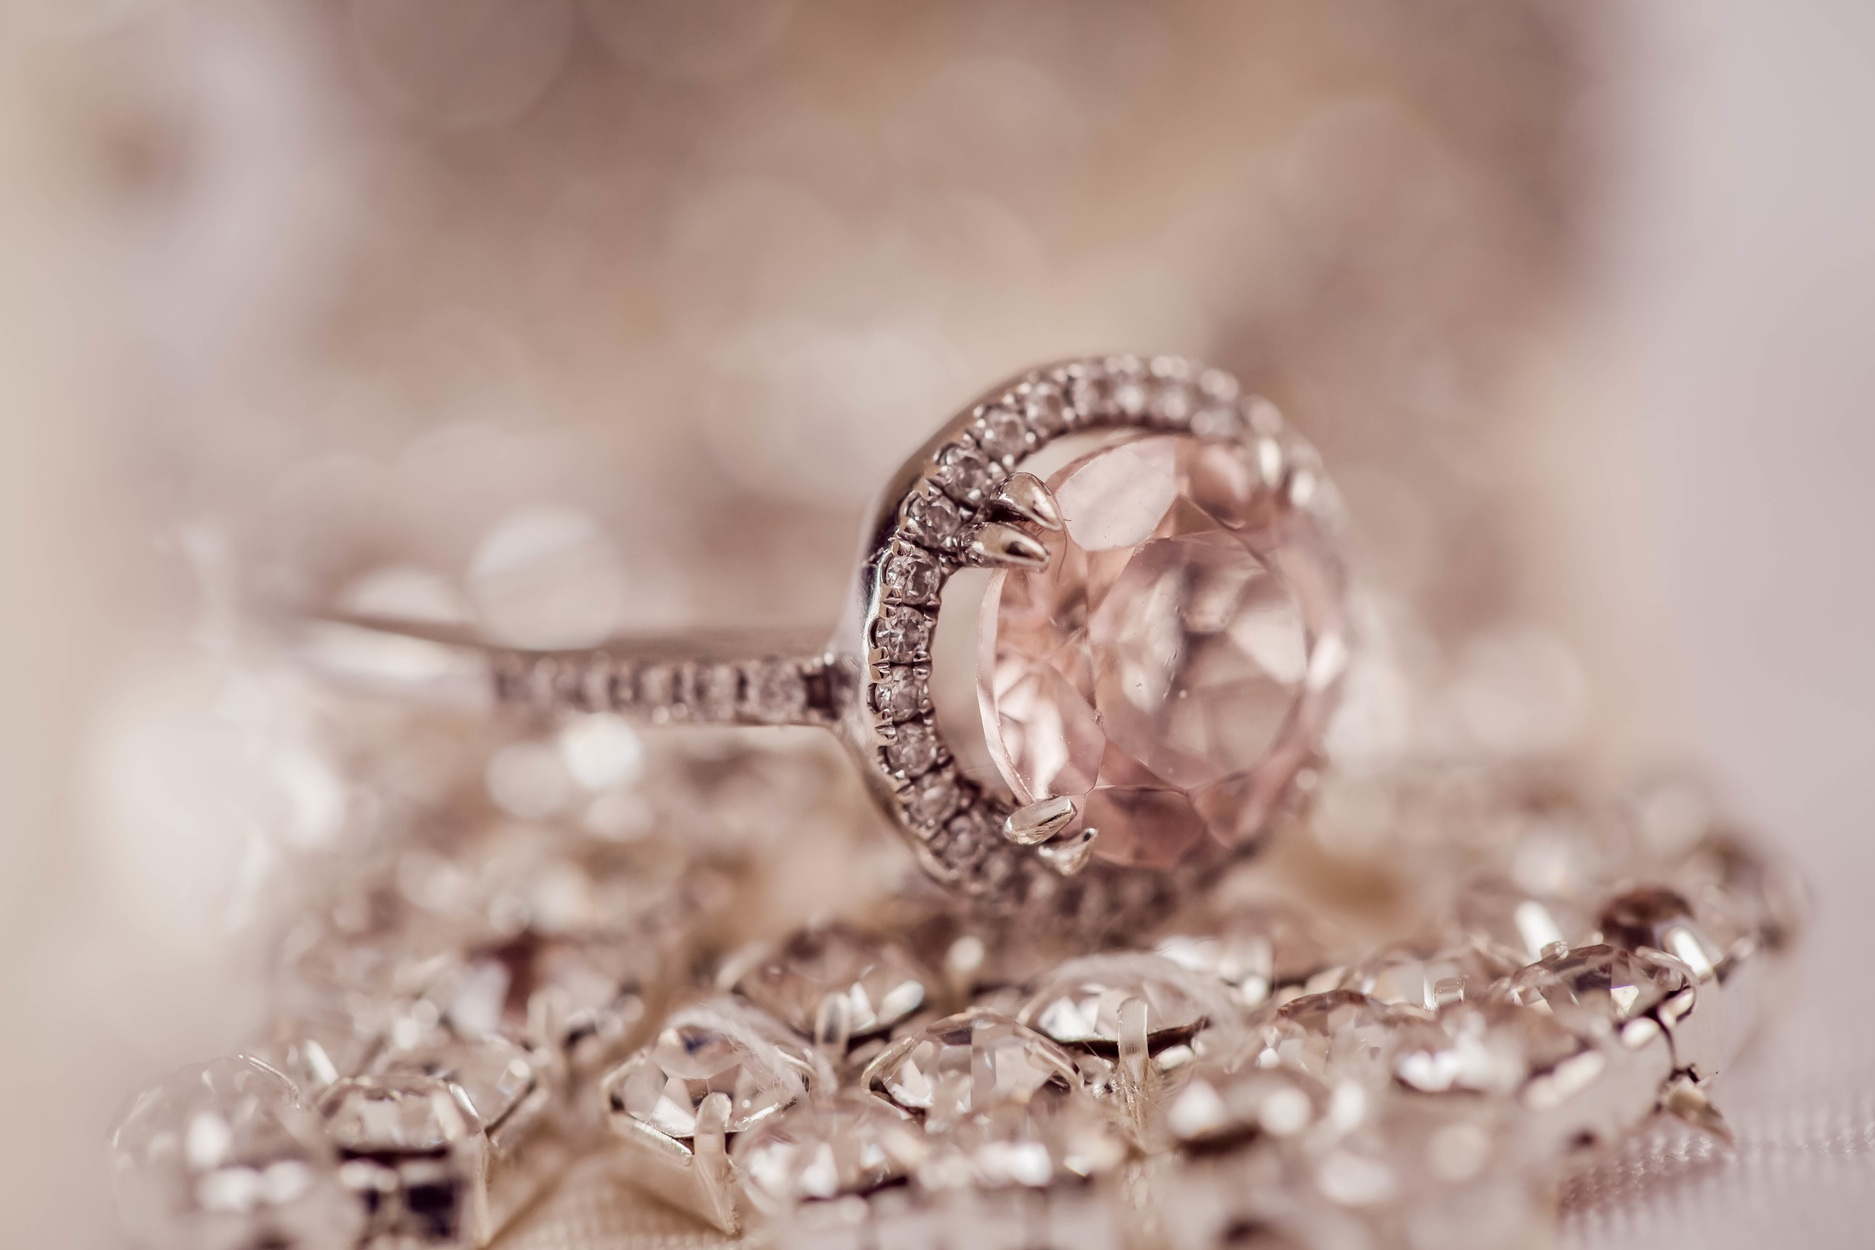 Match jewelry to neckline infographic